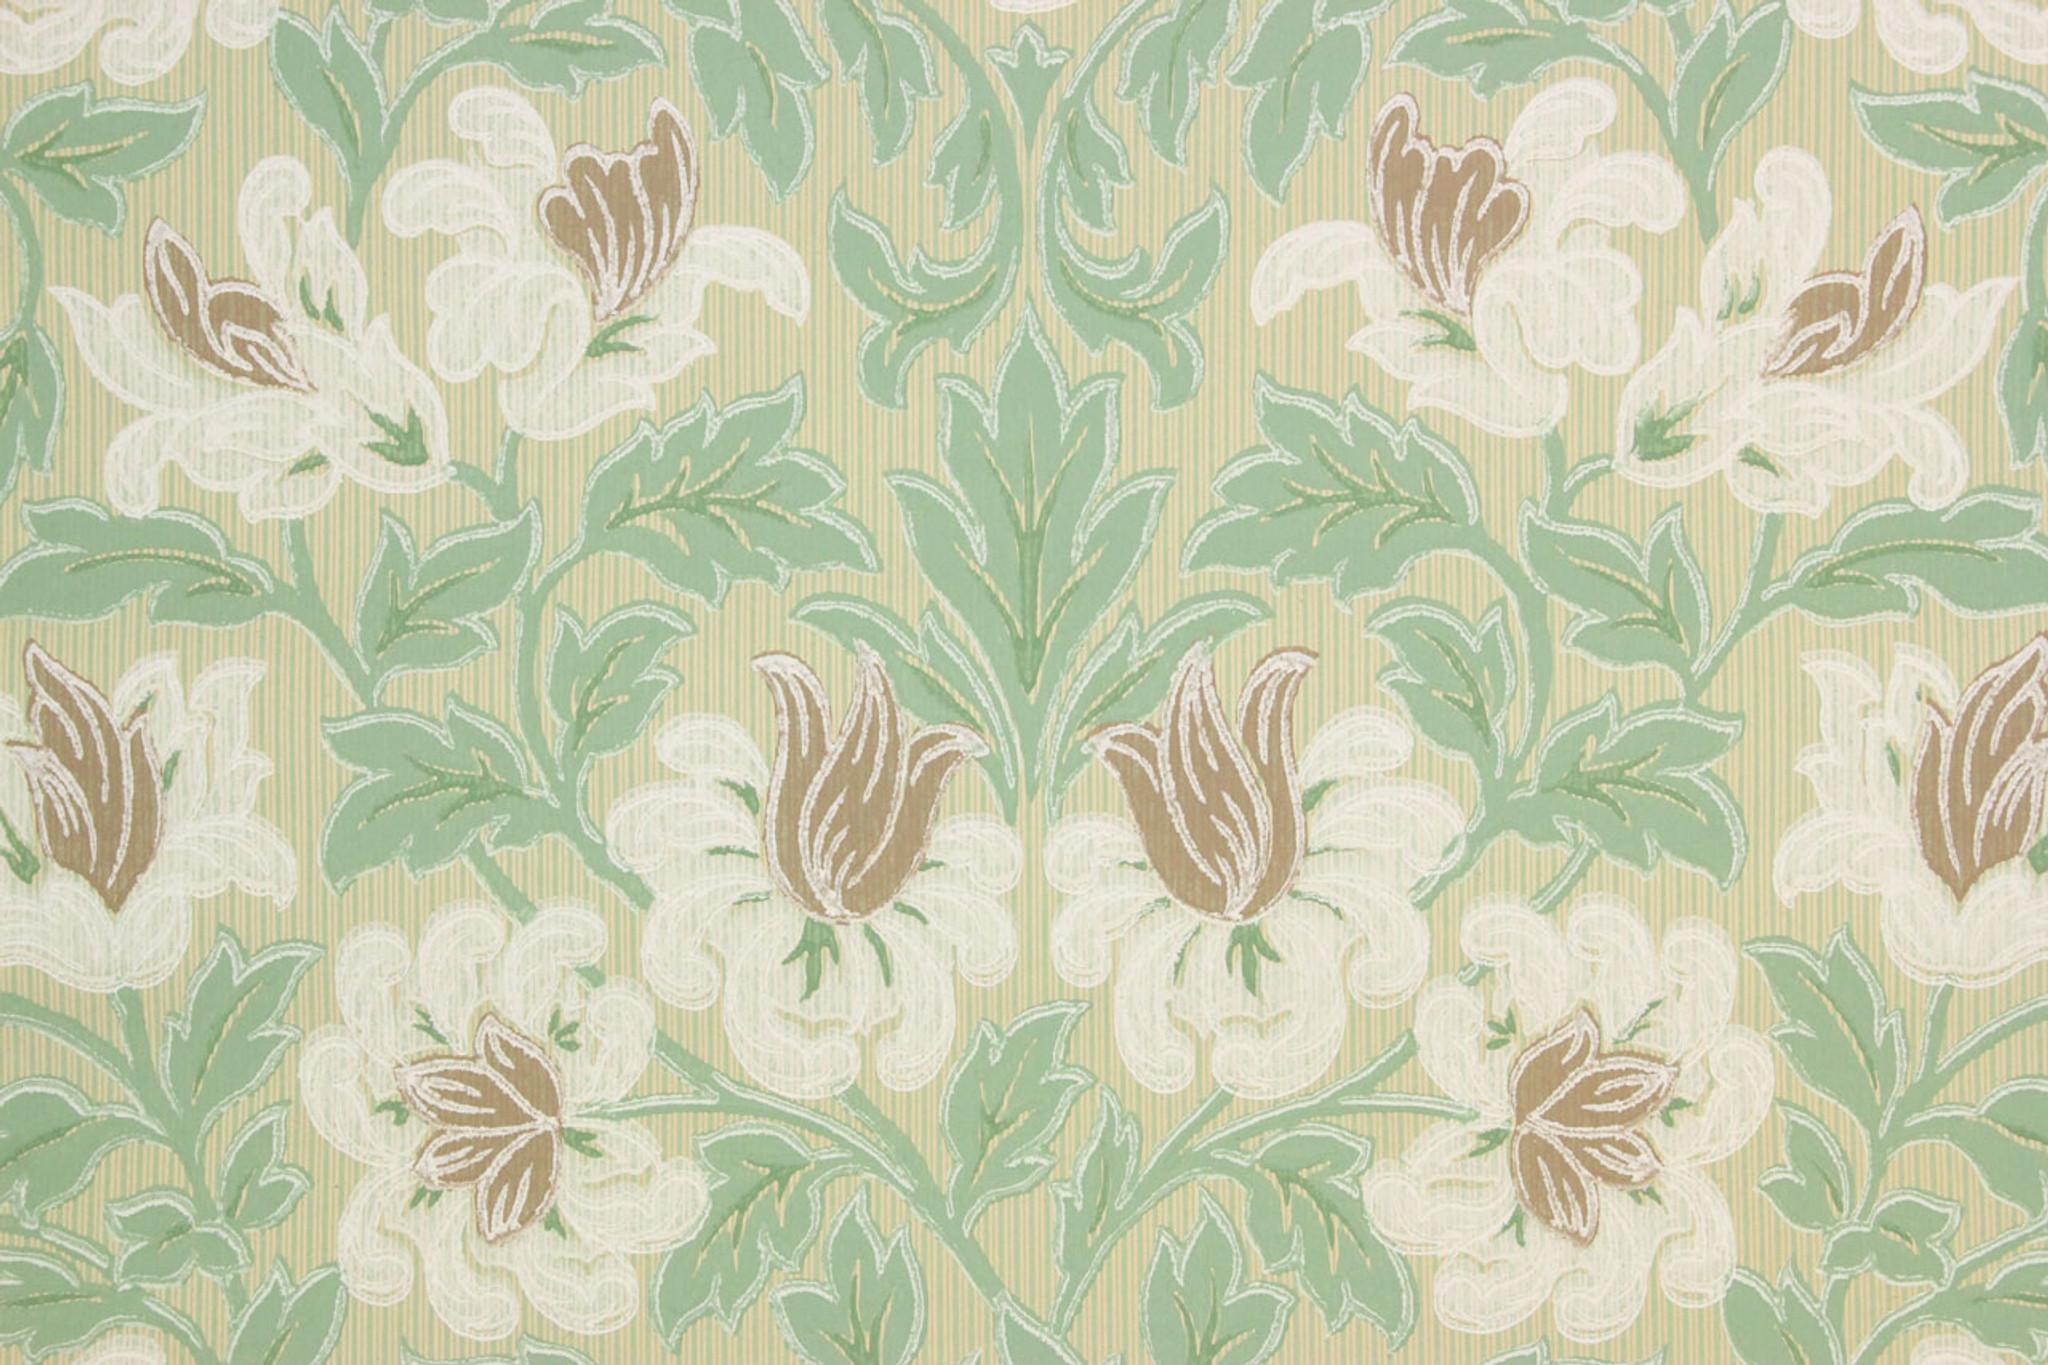 1930s Vintage Wallpaper White And Brown Flowers Rosie S Vintage